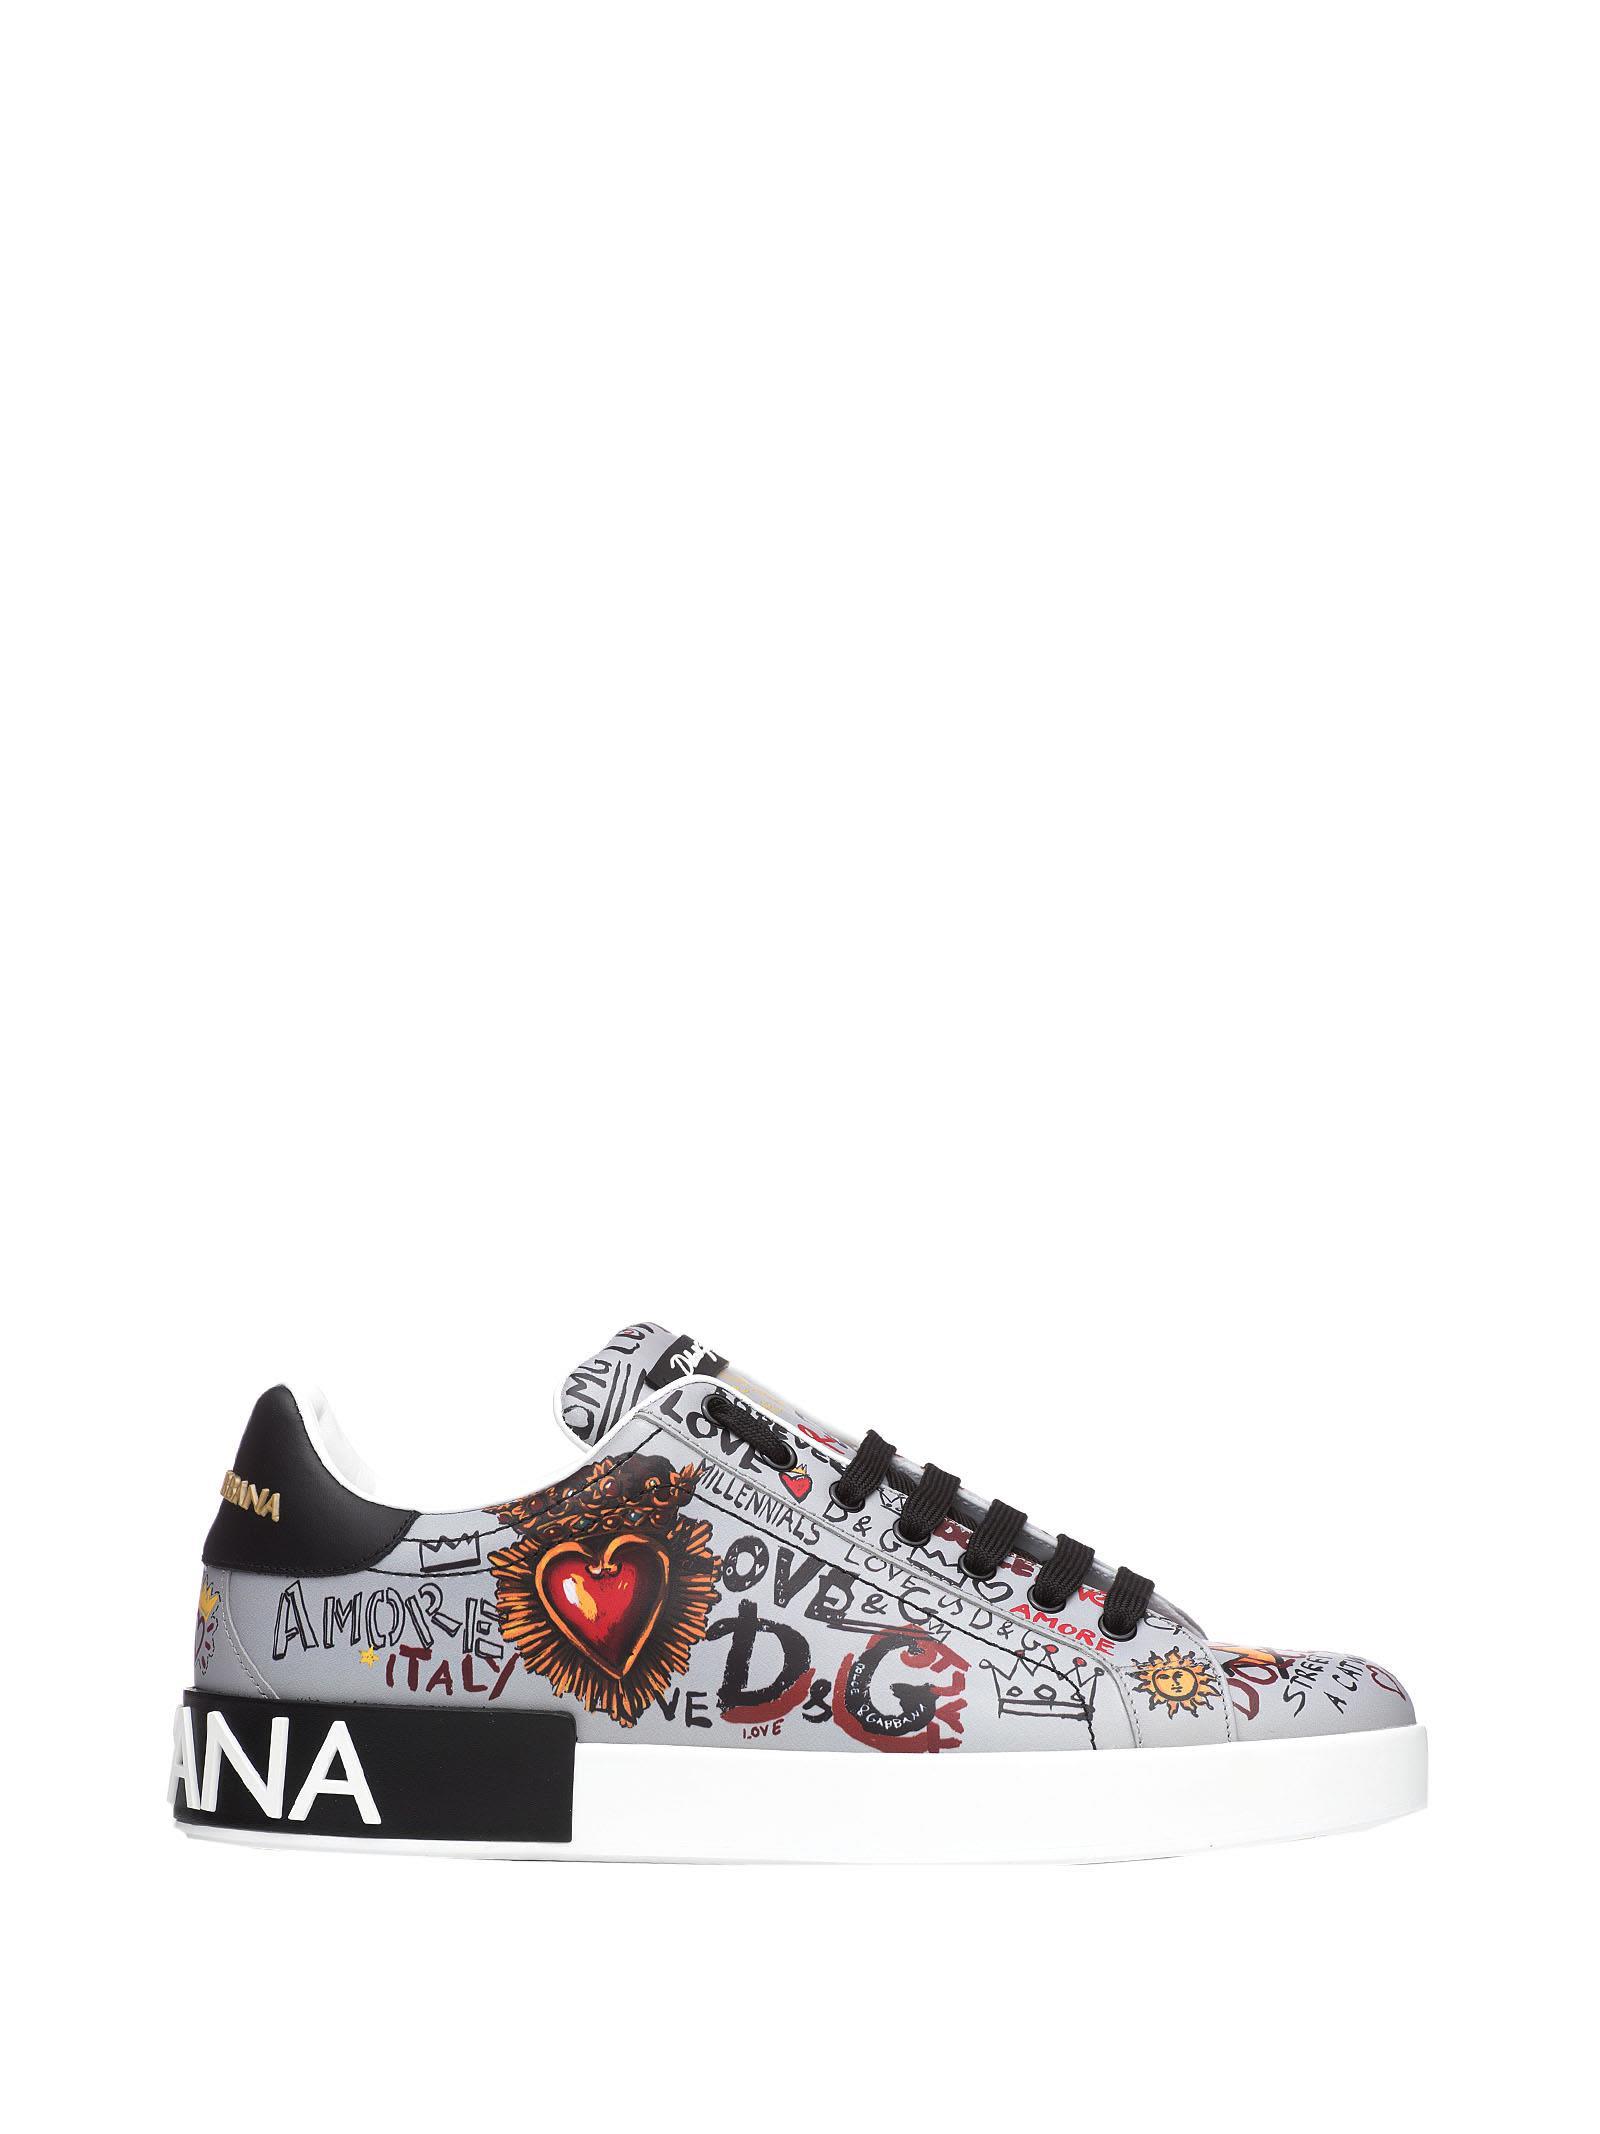 Portofino Grey Sneakers